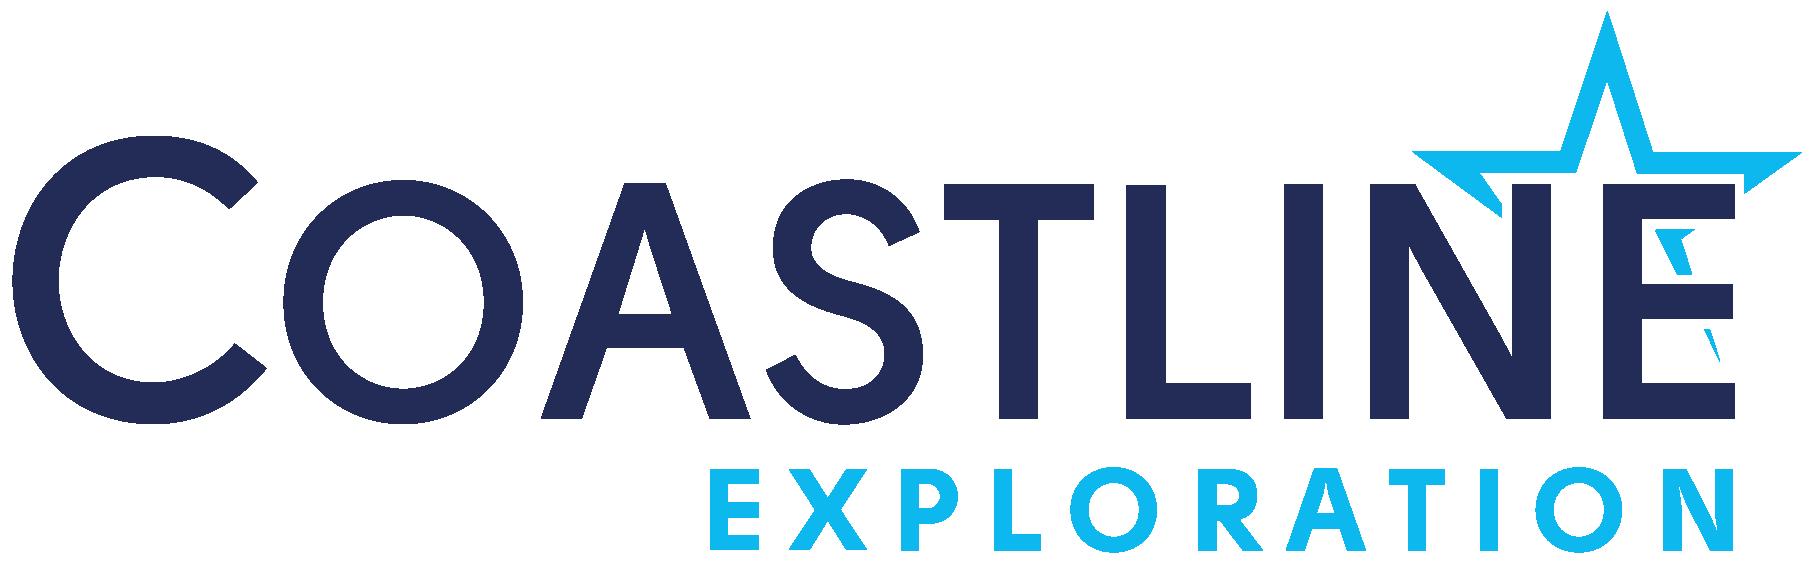 Coastline Exploration